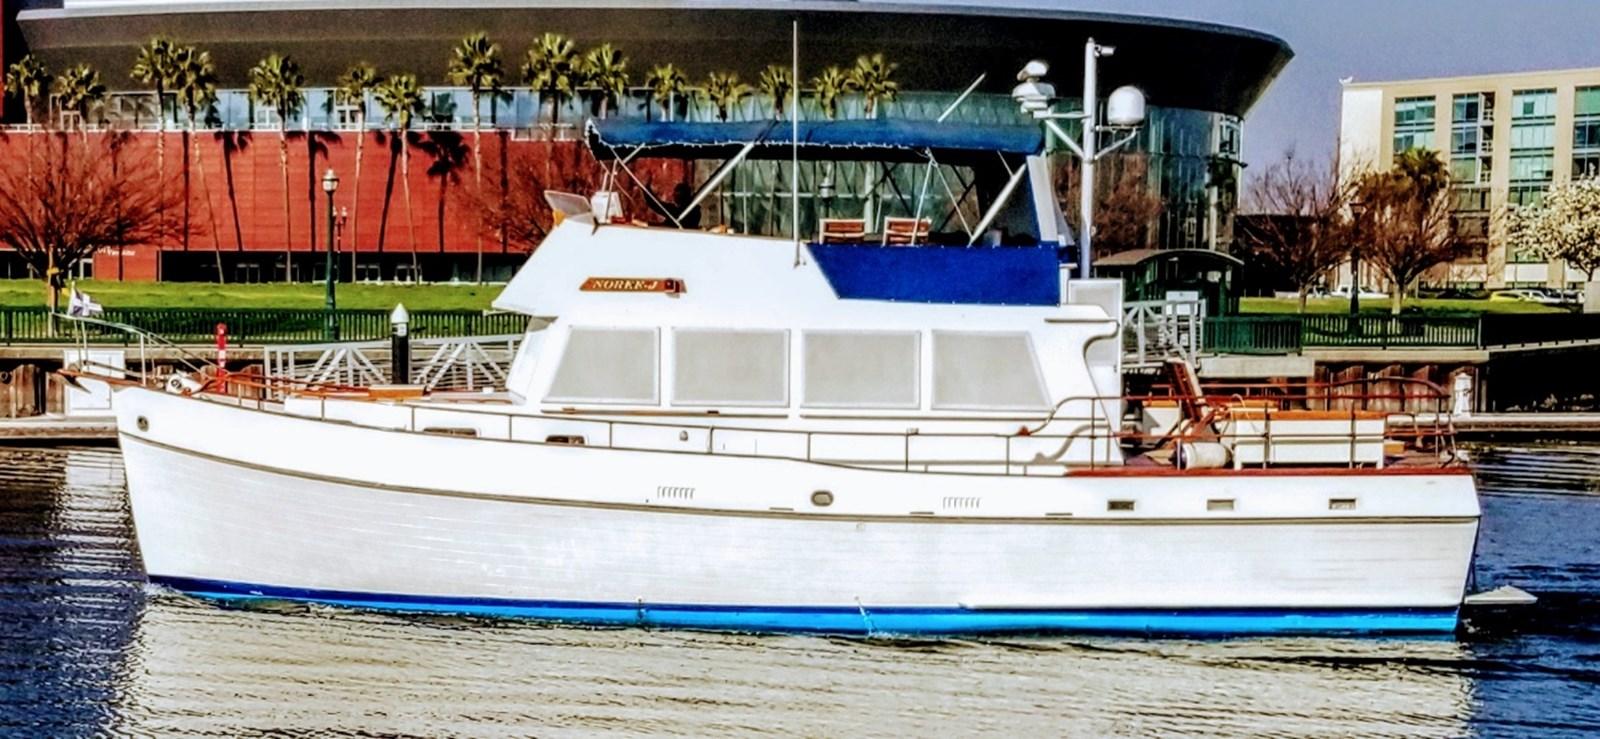 Noreej Cover Photo 1974 GRAND BANKS  Trawler 2952156